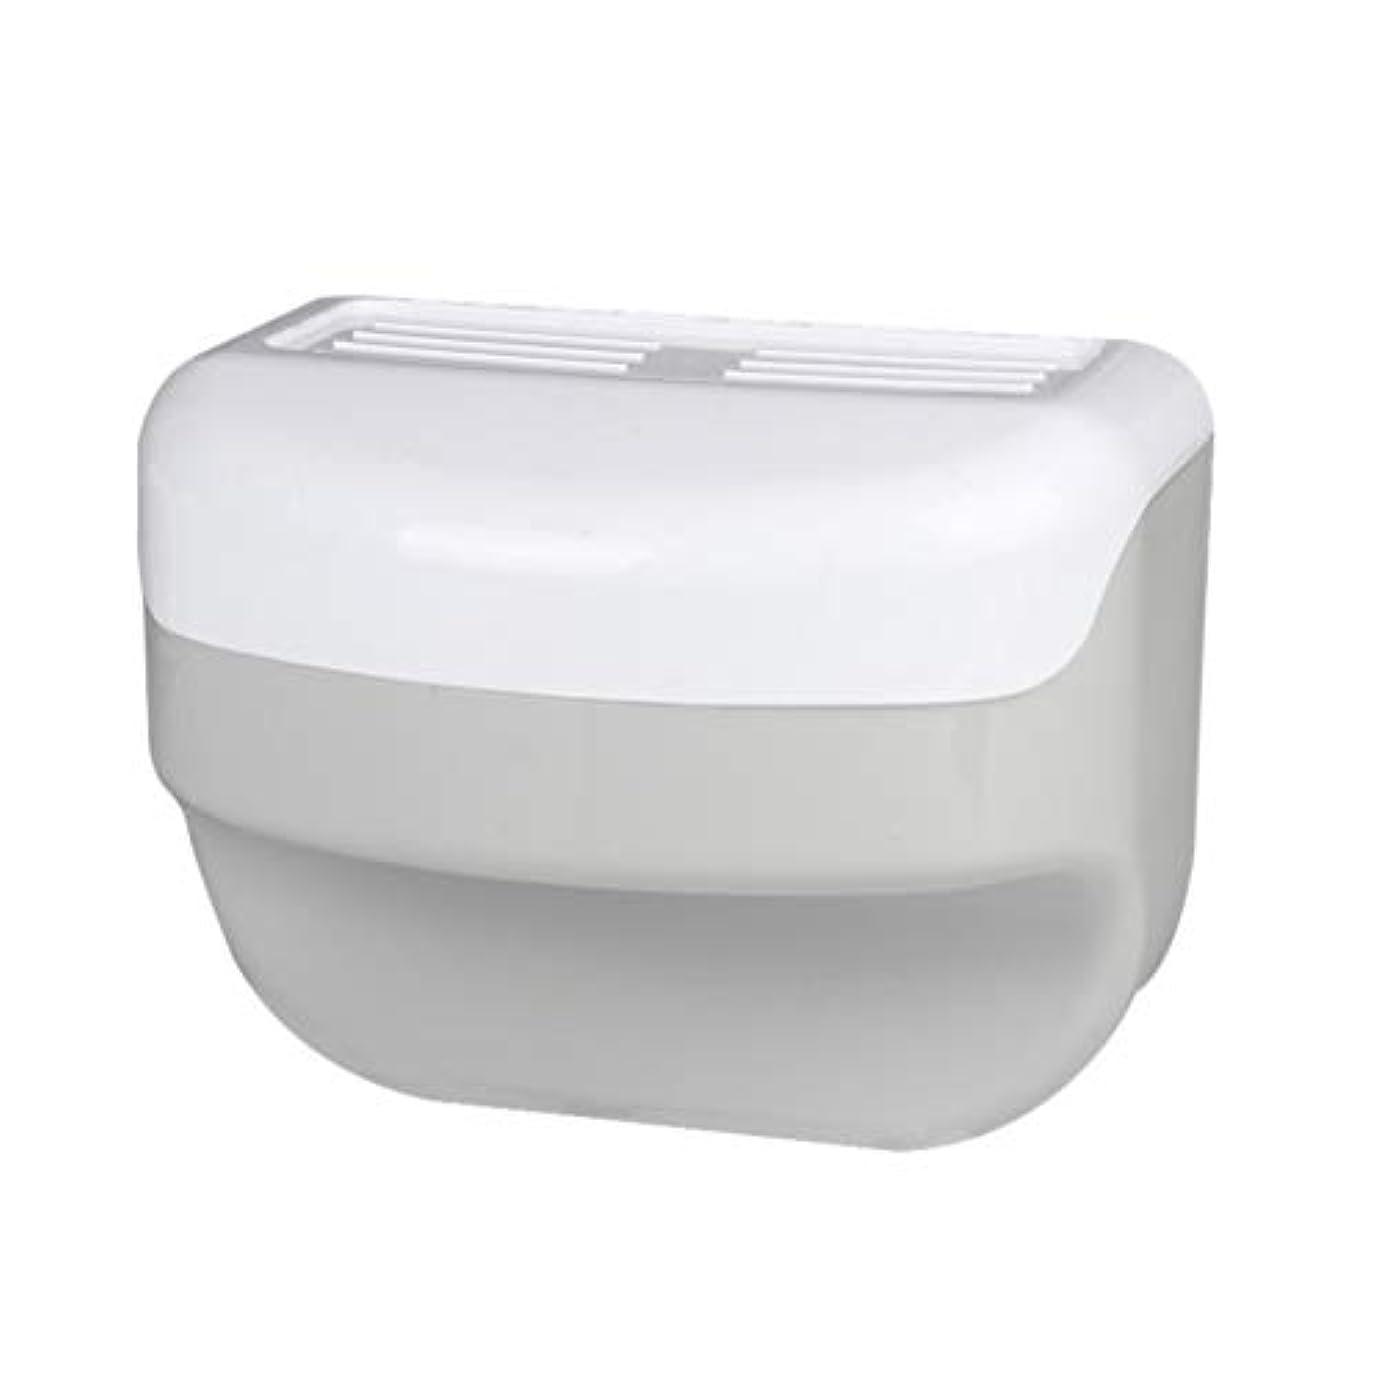 TOPBATHY 浴室トイレティッシュボックスラック壁吸盤ロールホルダーフリー掘削ネイルフリーティッシュボックス